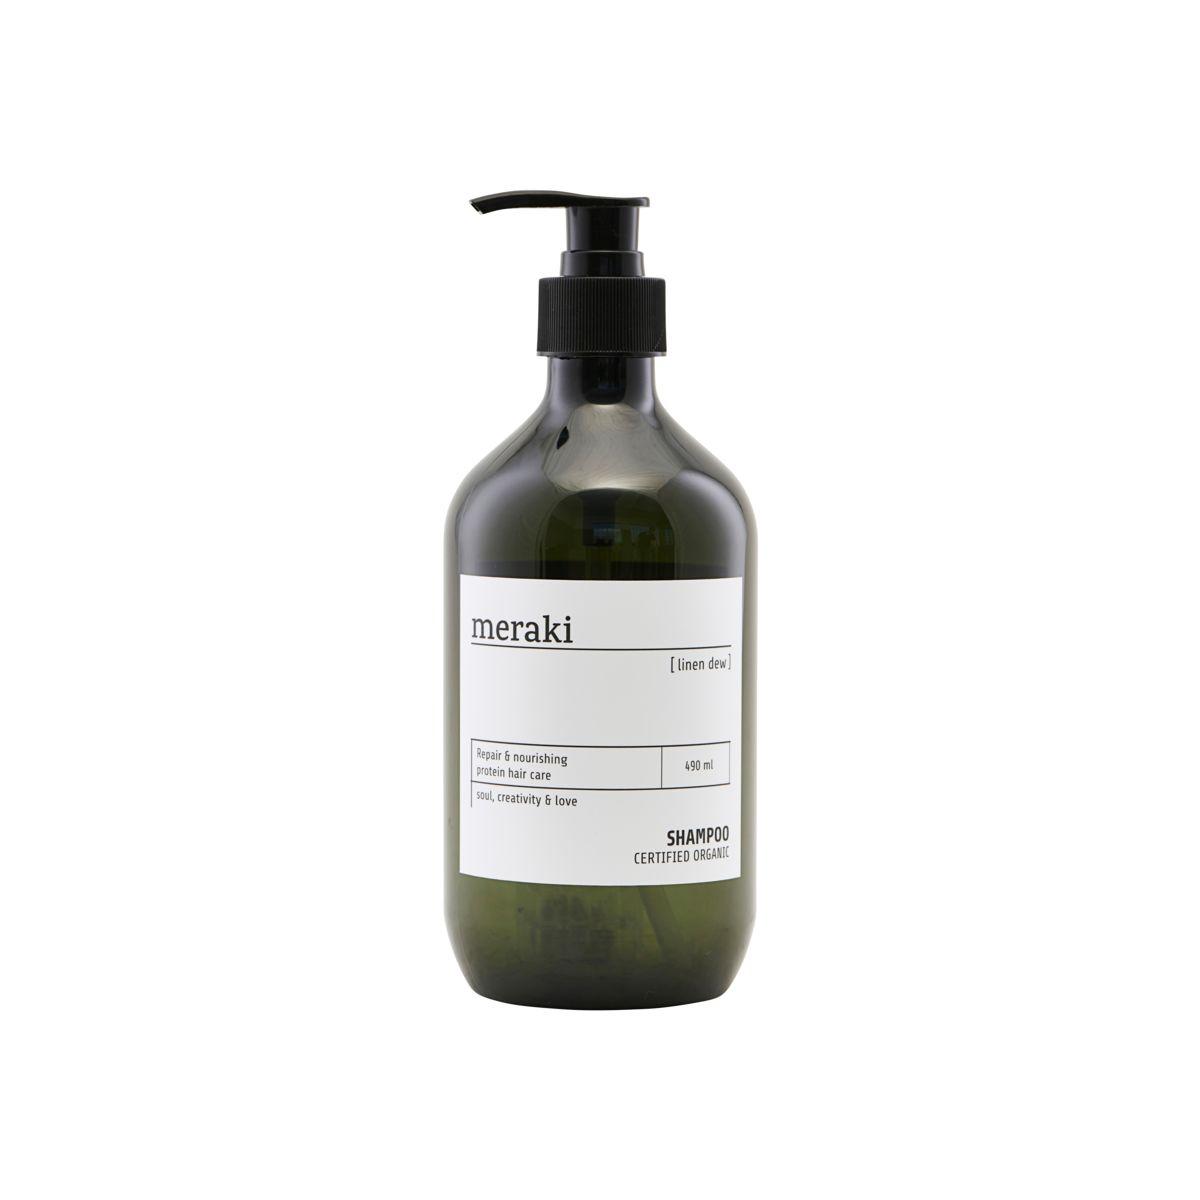 Meraki - Shampoo - Linnen dew